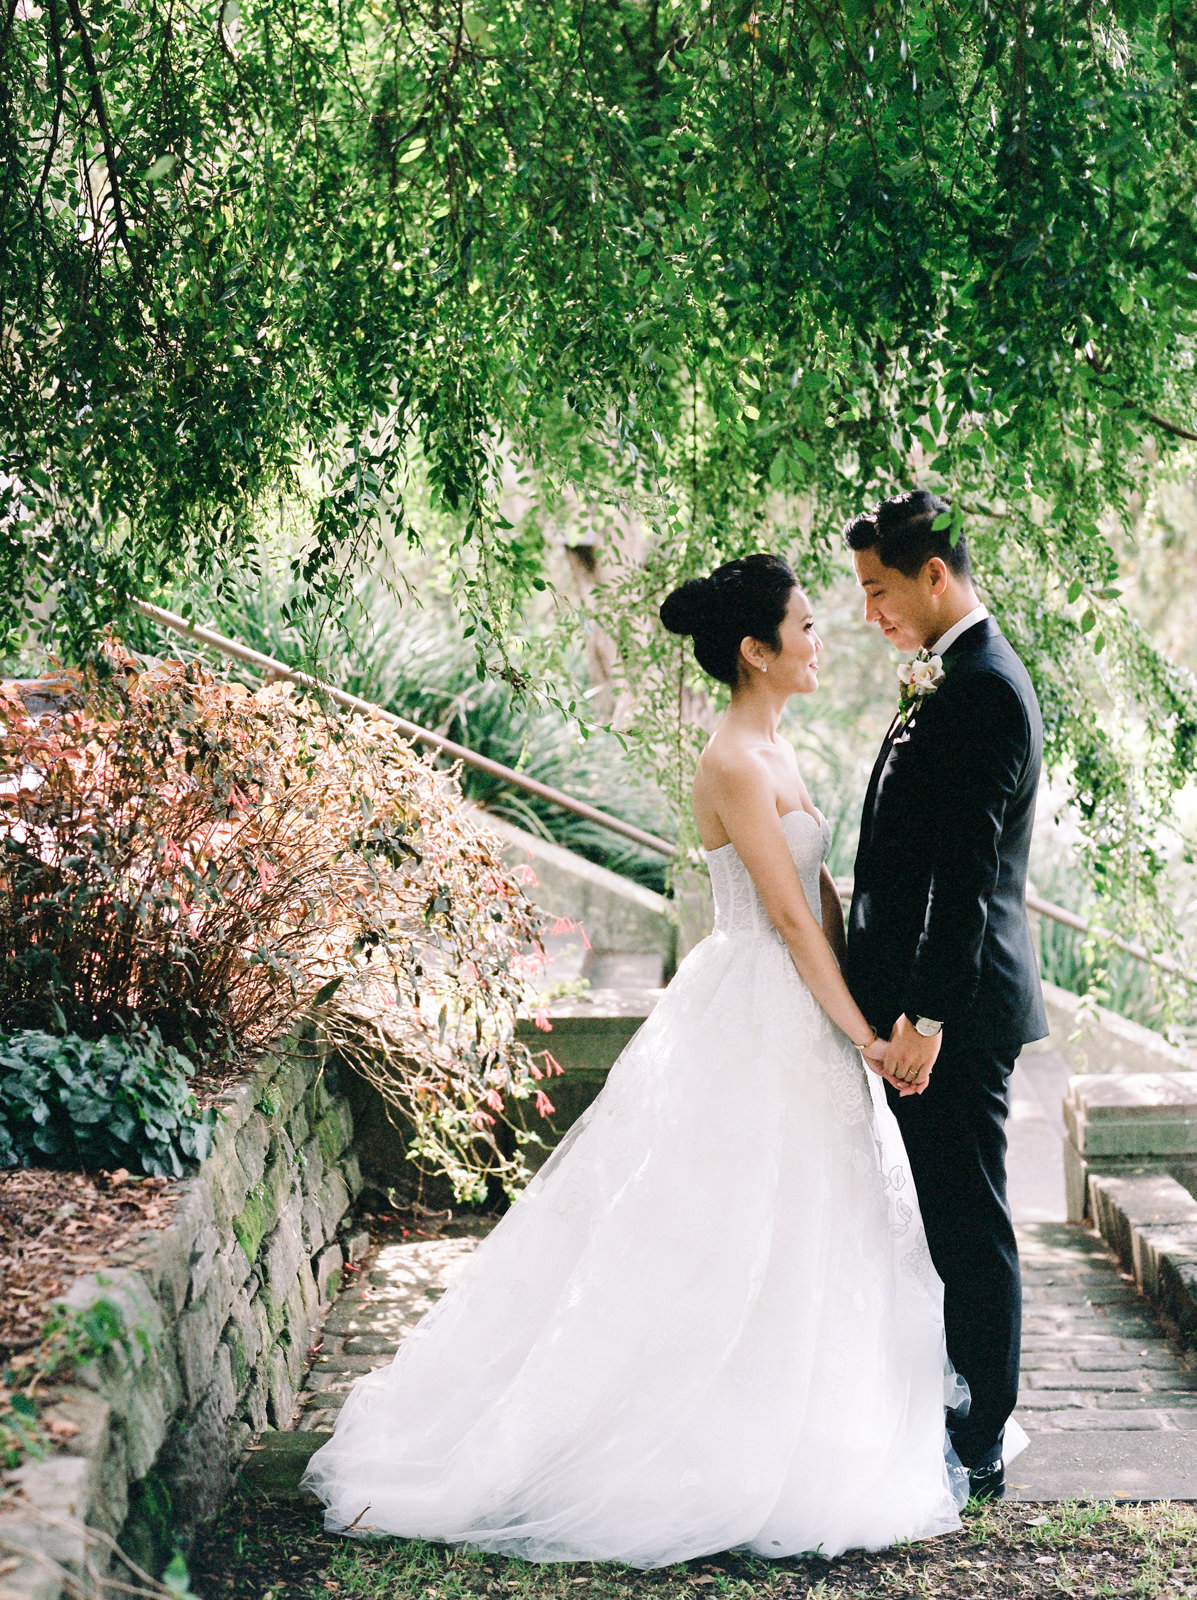 waop_jennifer&david_wedding-0457-2.jpg